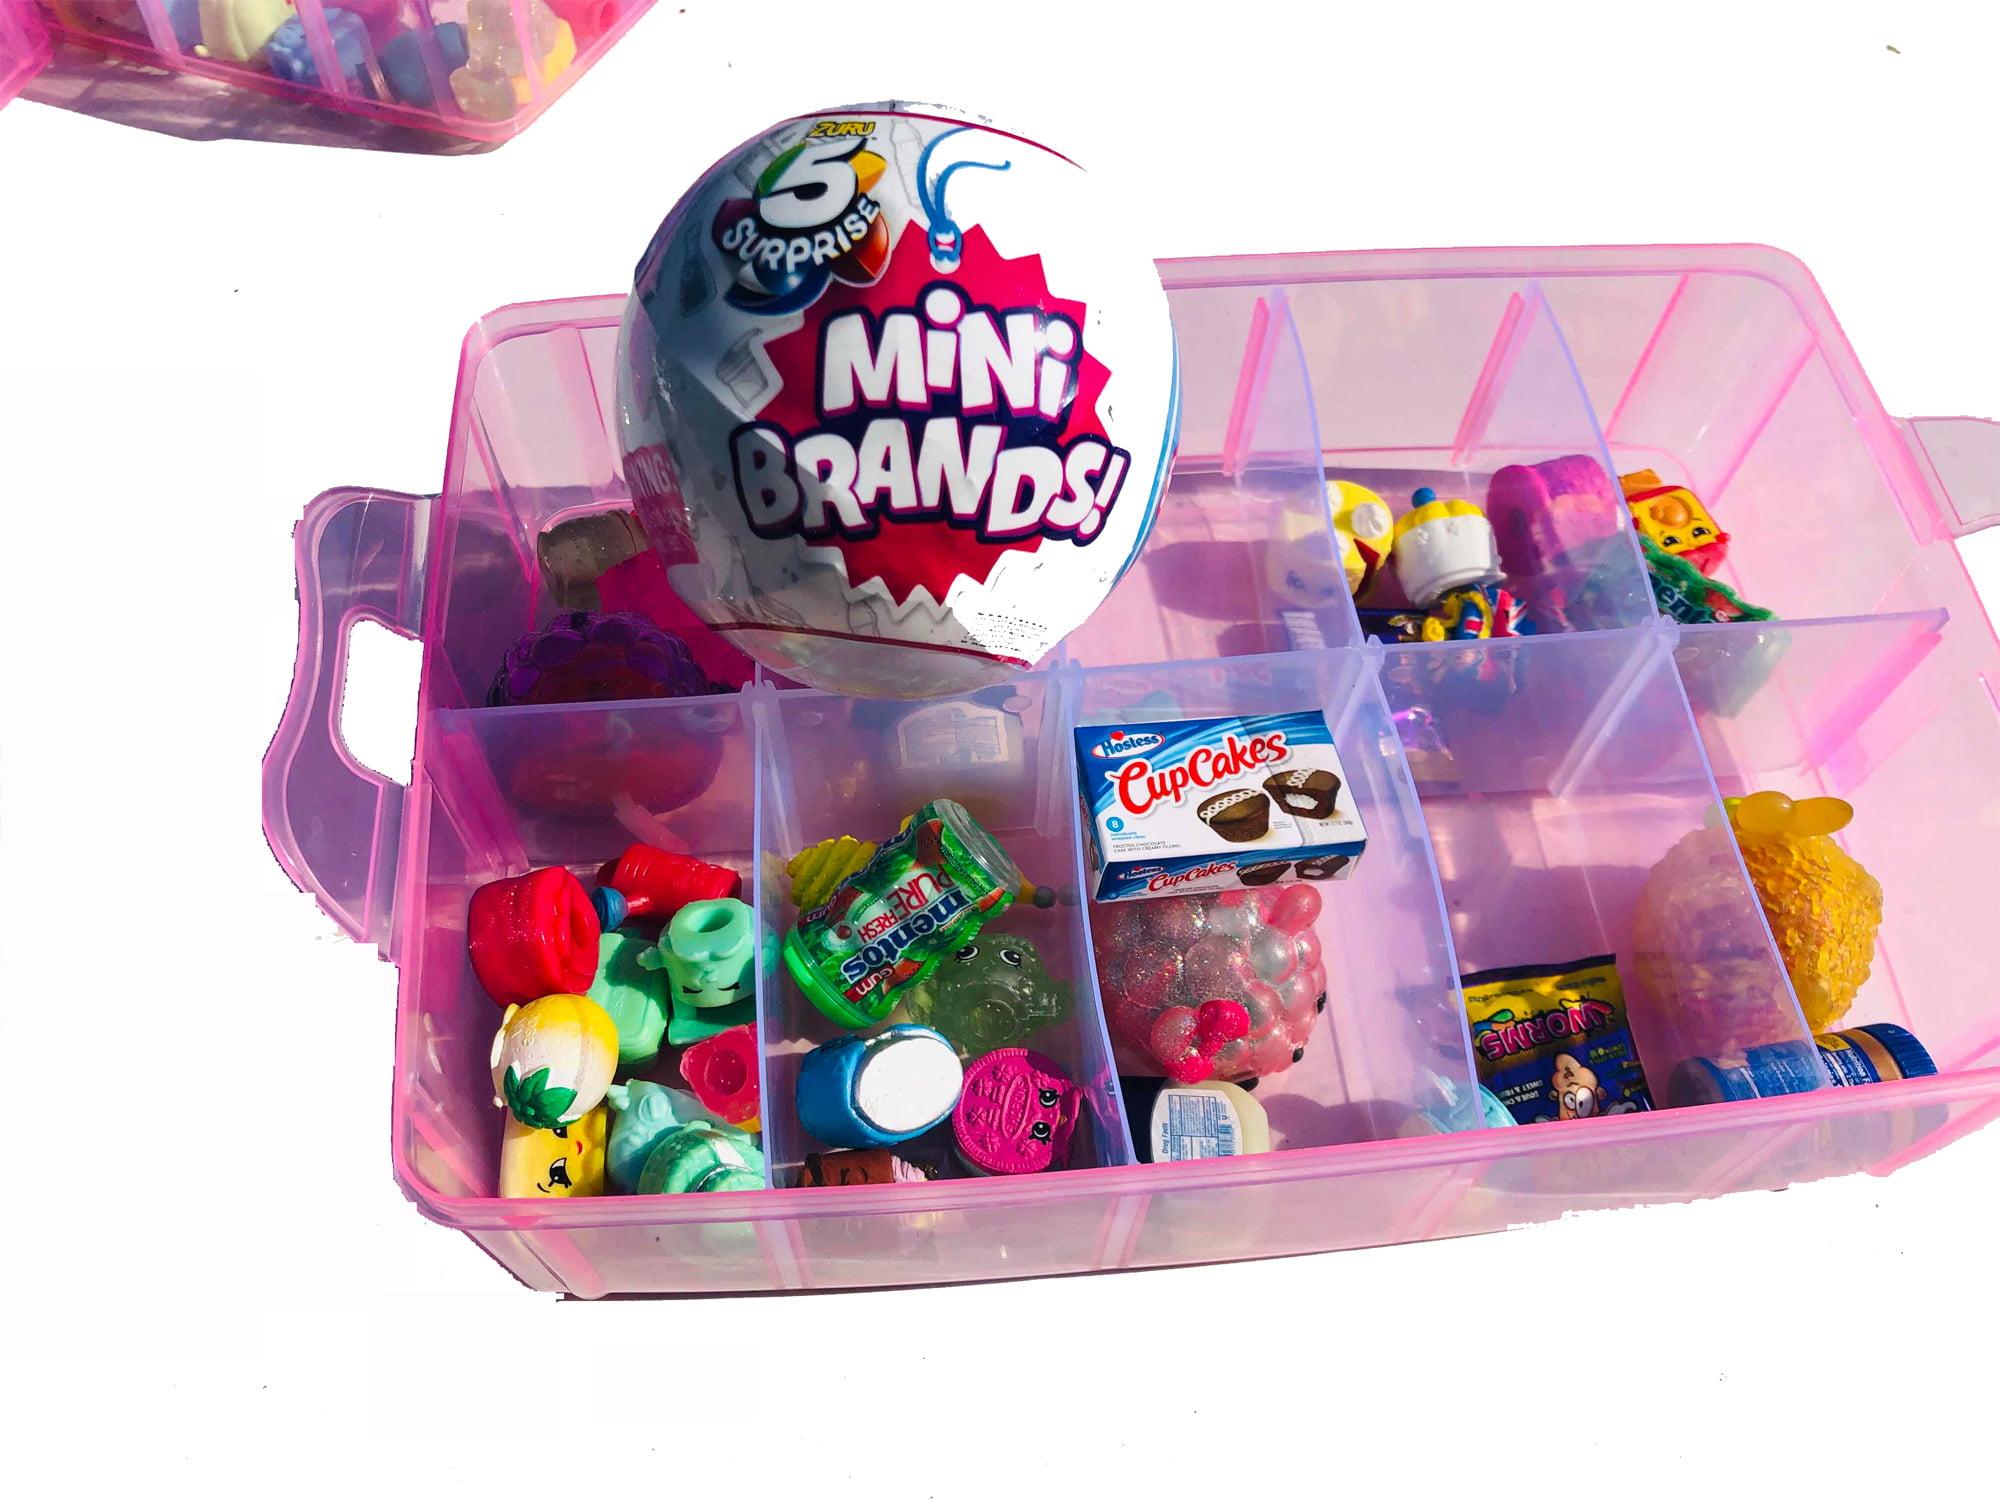 Omg Lol Dolls 5 Surprise Mini Brands Customizable Organizer Case Stackable 3 Tier 30 Compartments Perfect For Dolls Collectible Toys 5 Surprise Mini Brands Ball Not Included Walmart Com Walmart Com